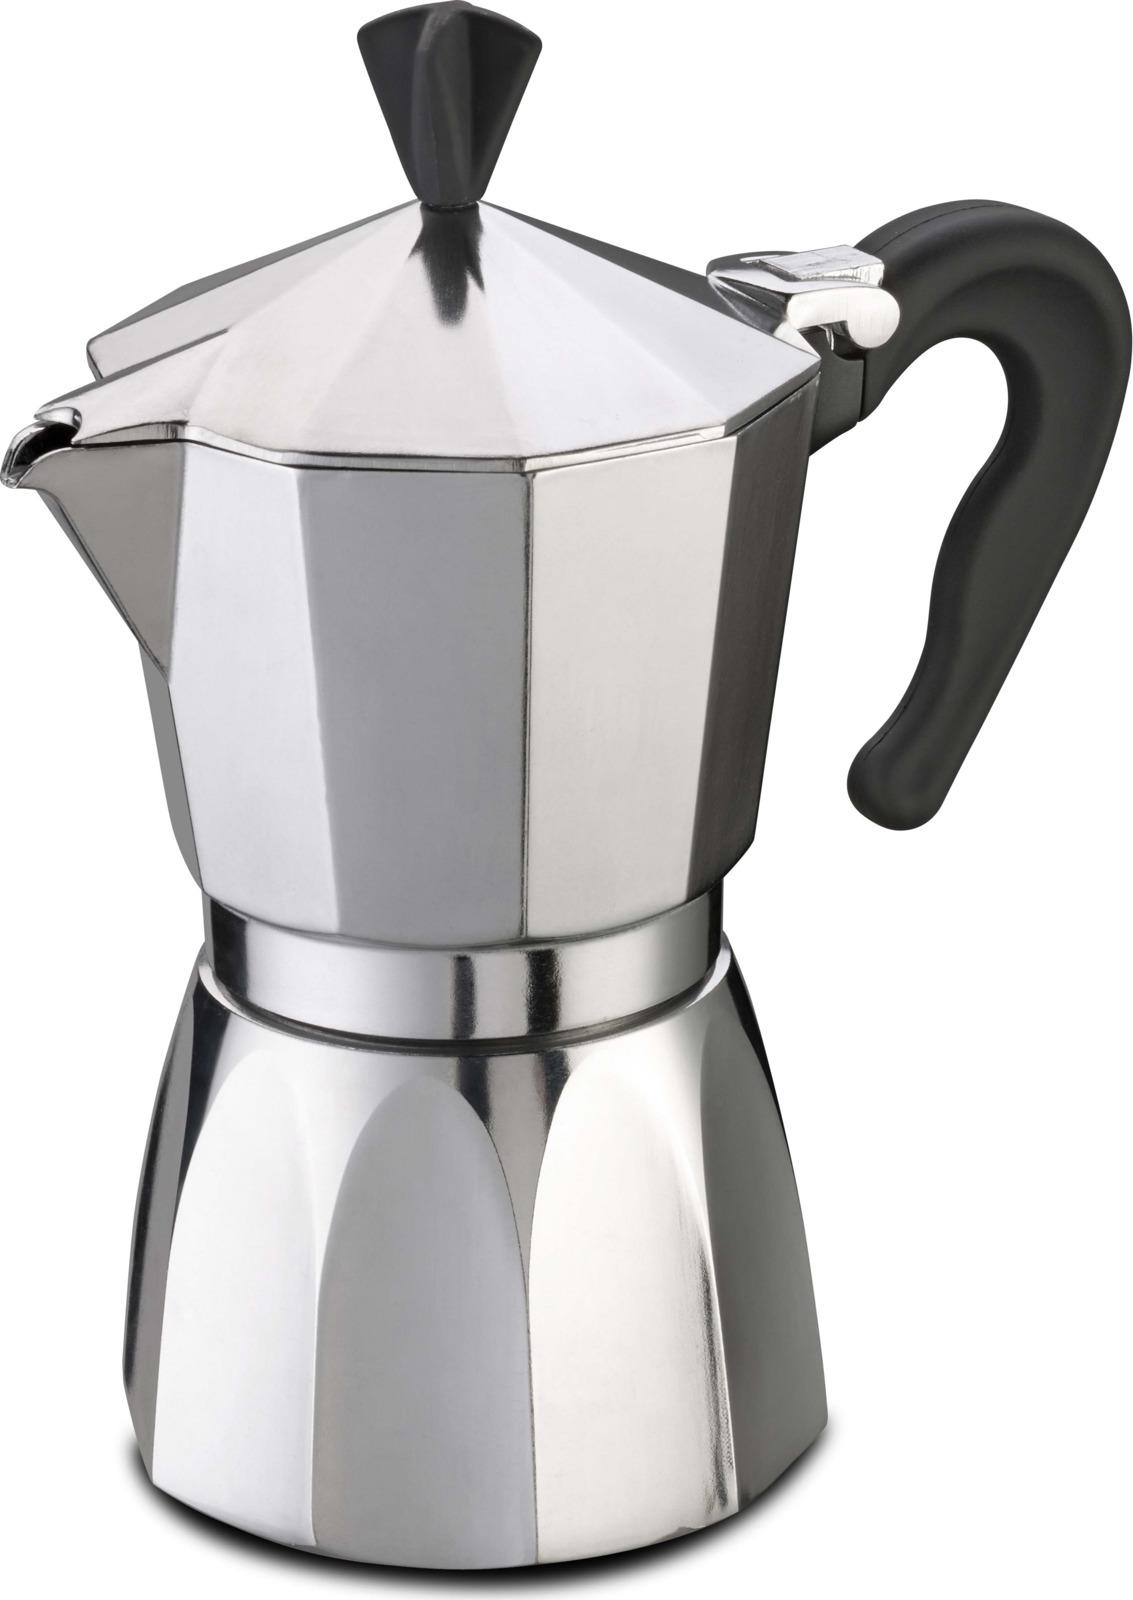 Гейзерная кофеварка Supermoka, Алюминий цены